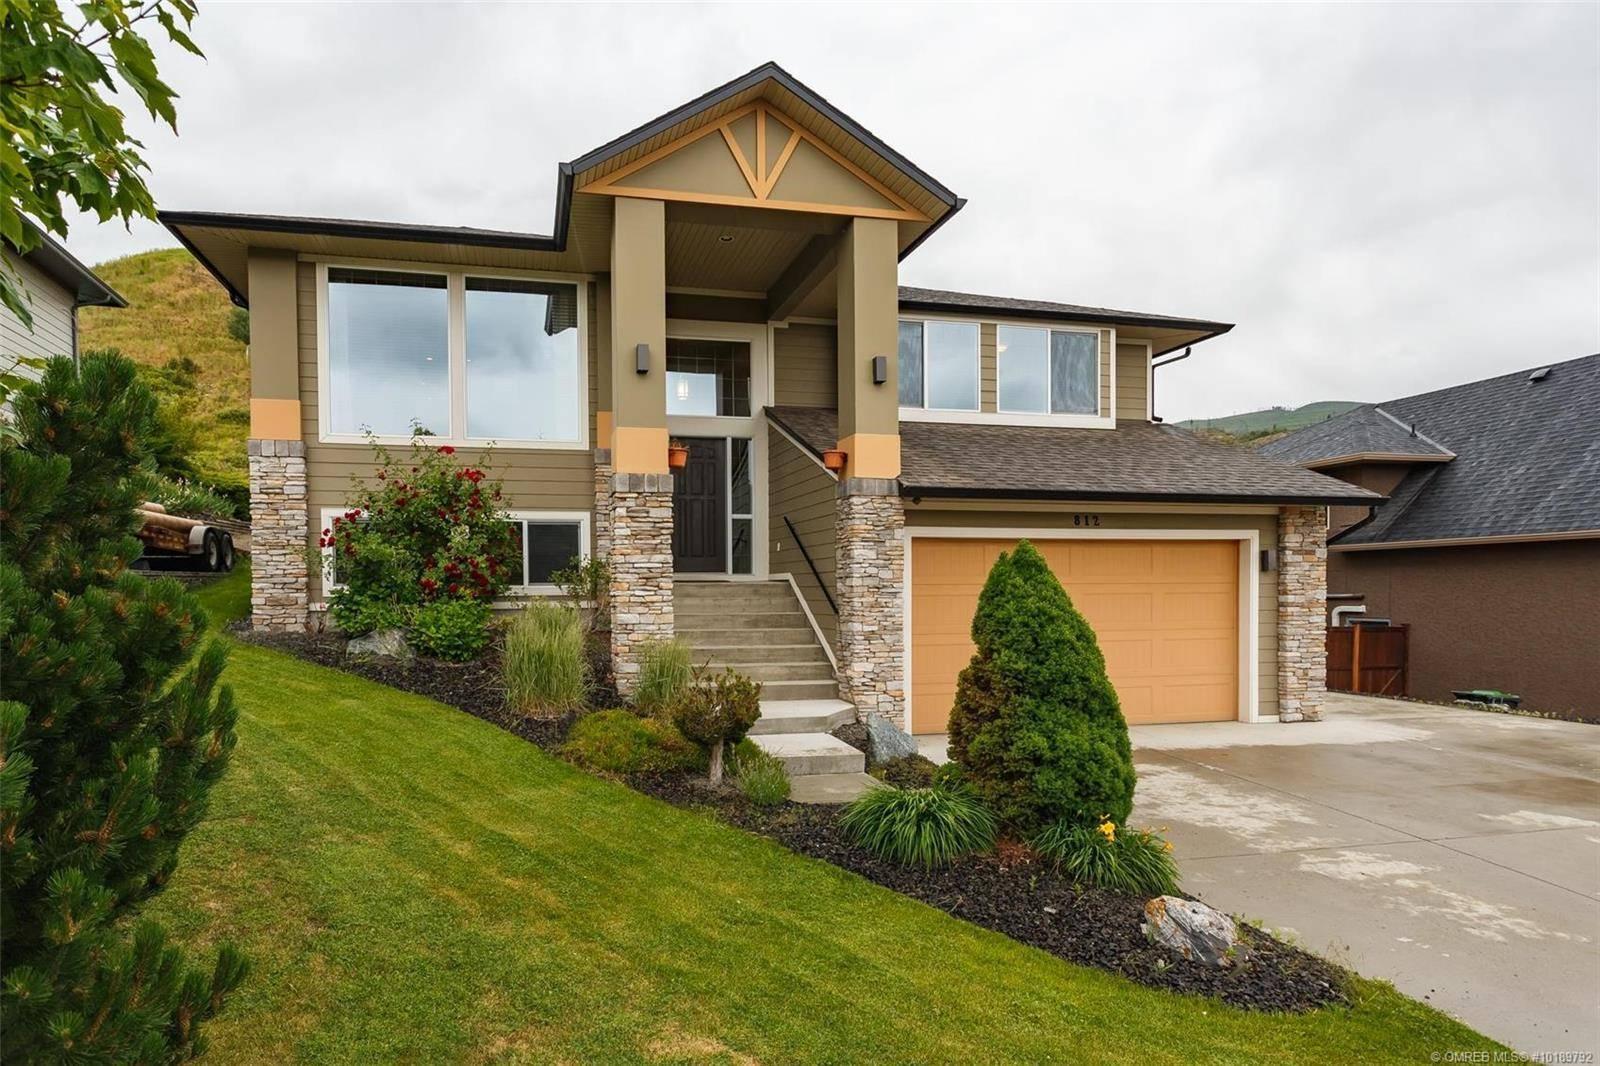 House for sale at 812 Kuipers Cres Kelowna British Columbia - MLS: 10189792